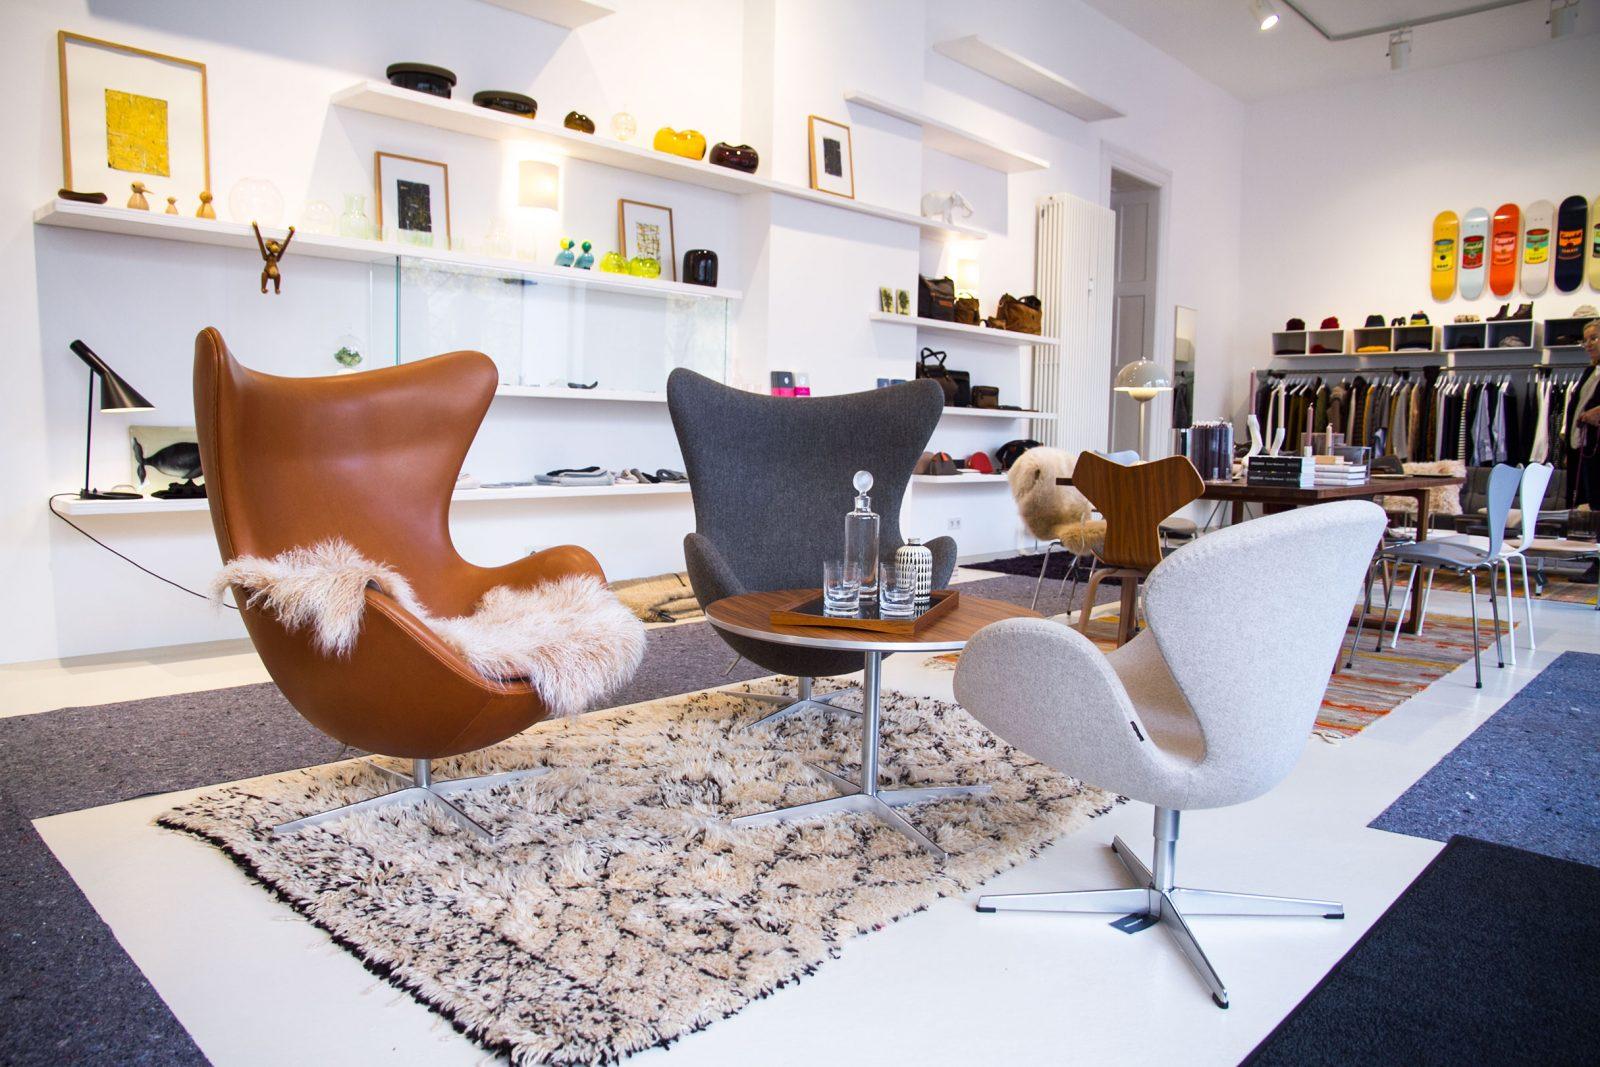 Interior Spots Munich Falkenberg on Lifetime-Pieces.com